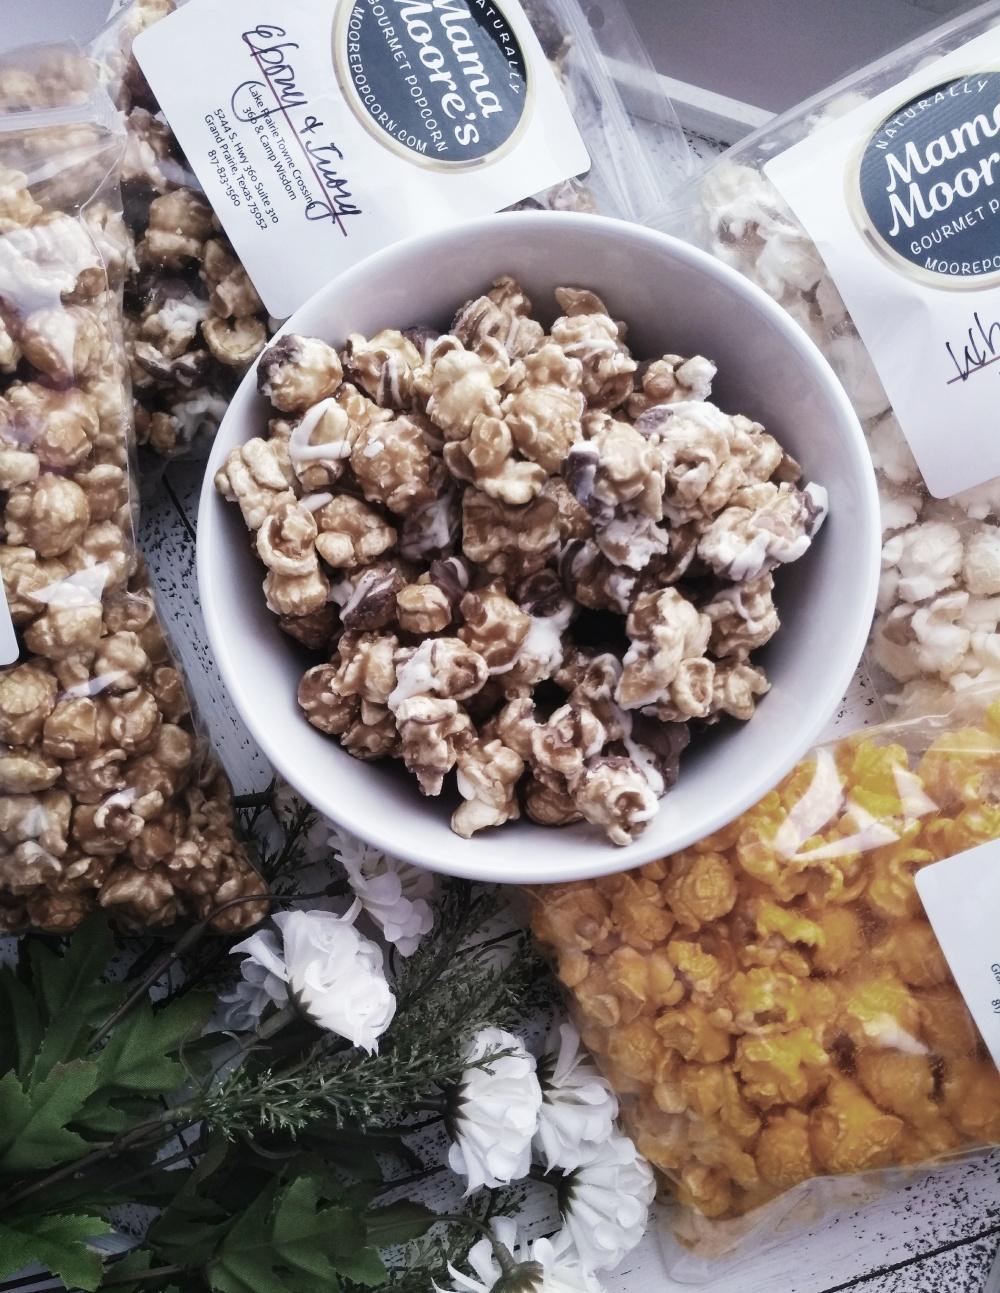 JustNatonya-Mama-Moore's-Gourmet-Popcorn